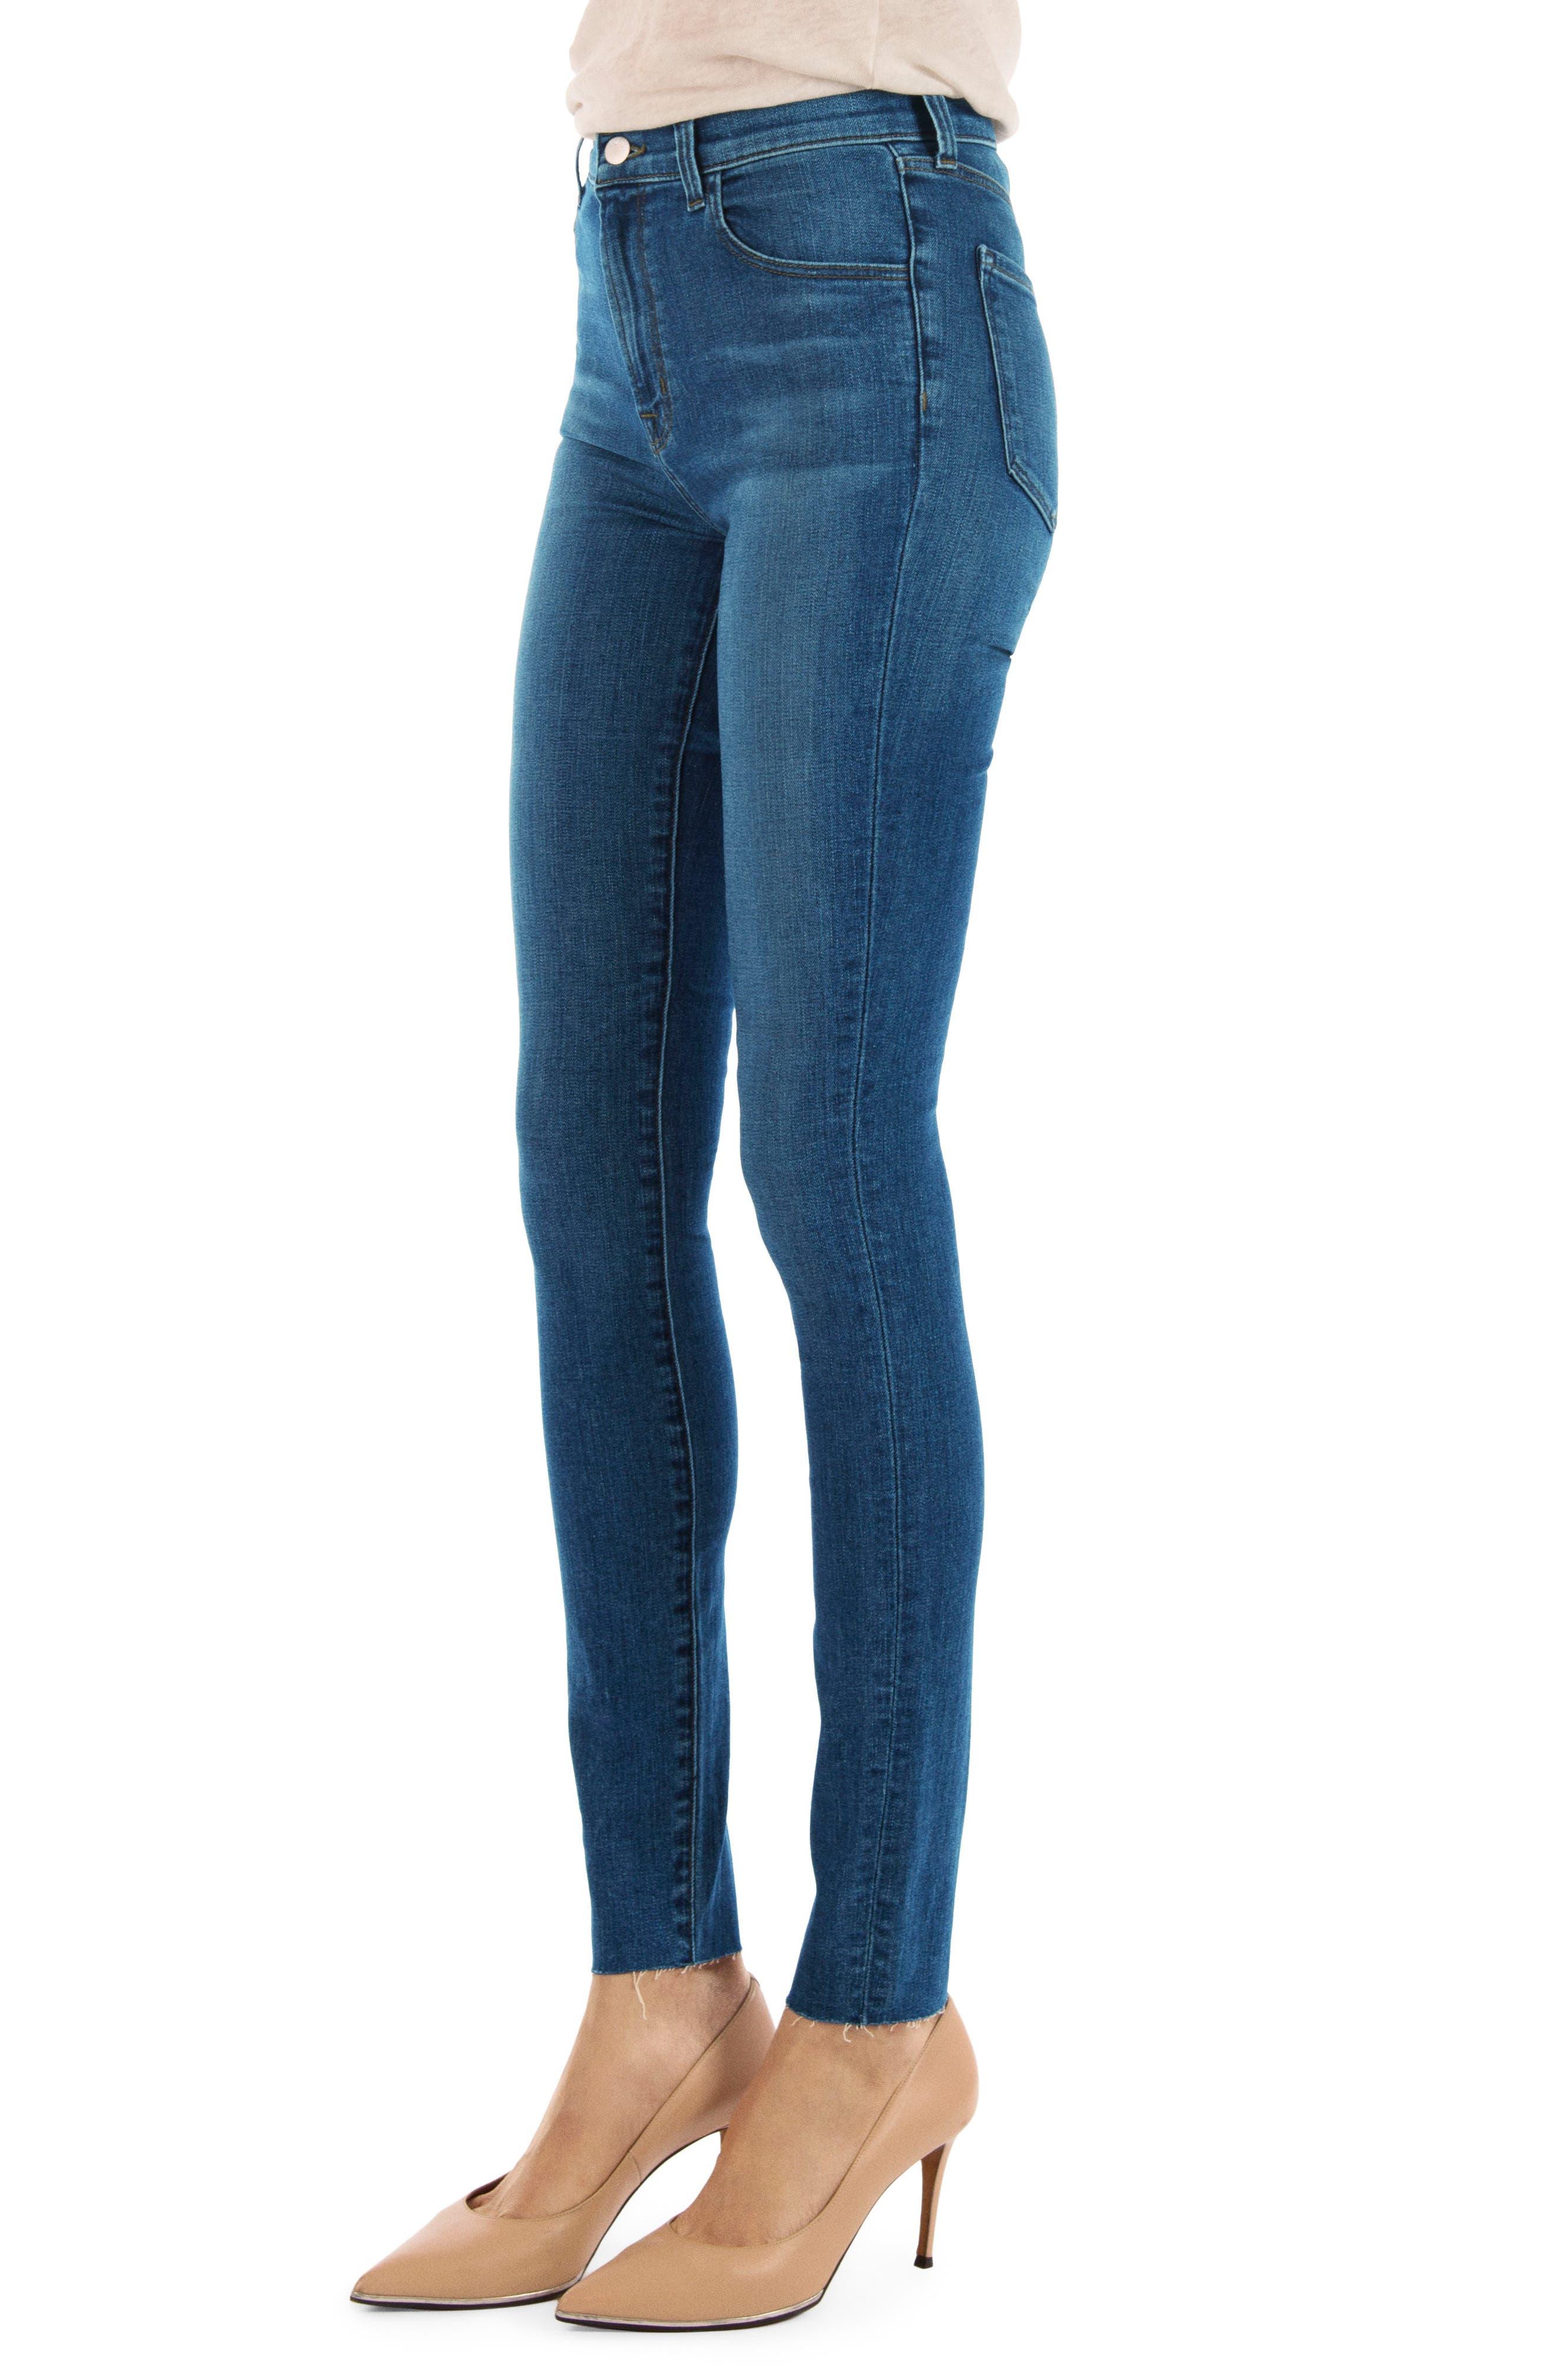 Carolina Super High Waist Skinny Jeans,                             Alternate thumbnail 3, color,                             LOVESICK